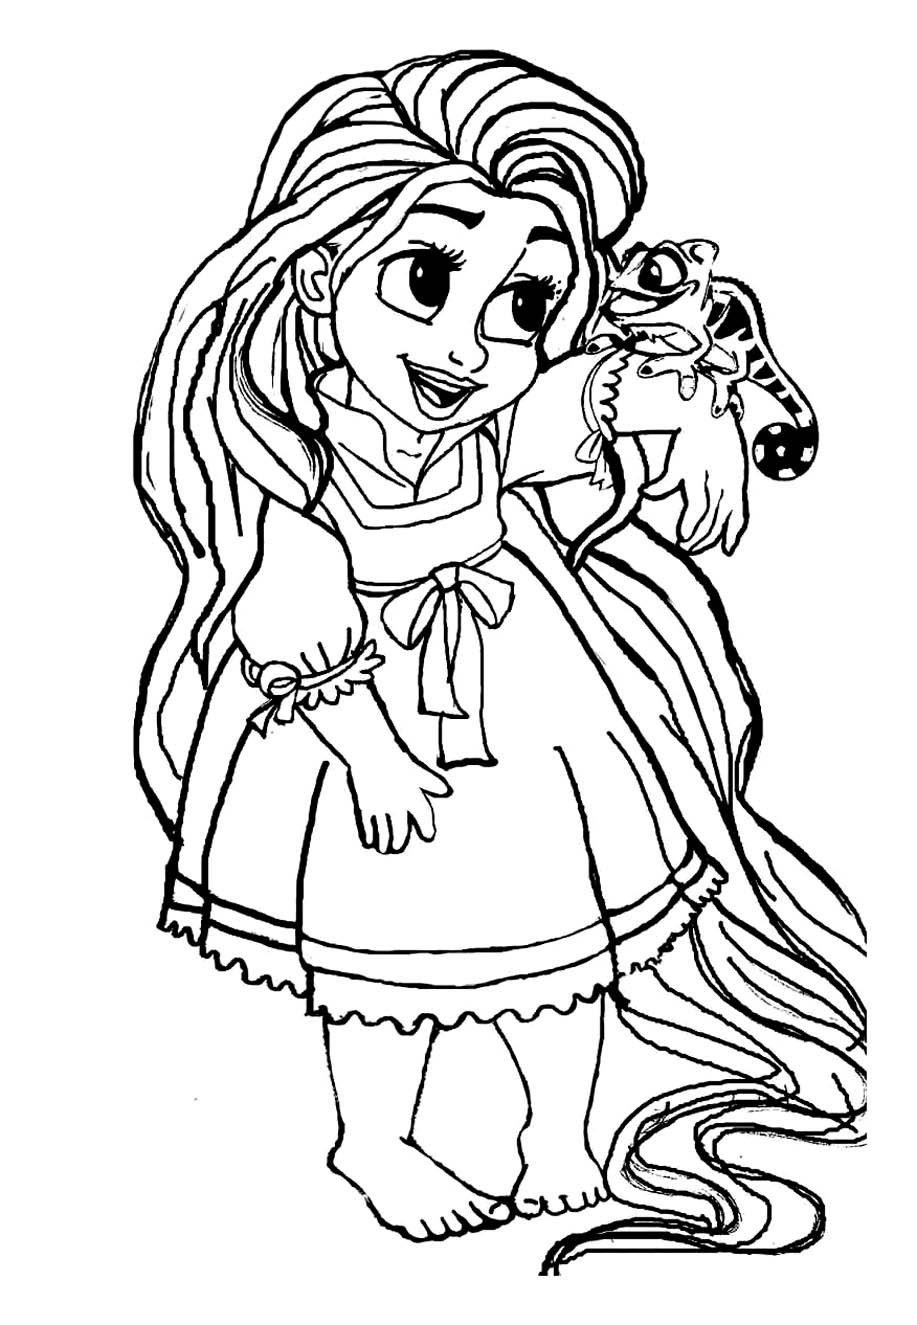 Coloriage Kids Dessin Kawaii Princesse Disney Raiponce